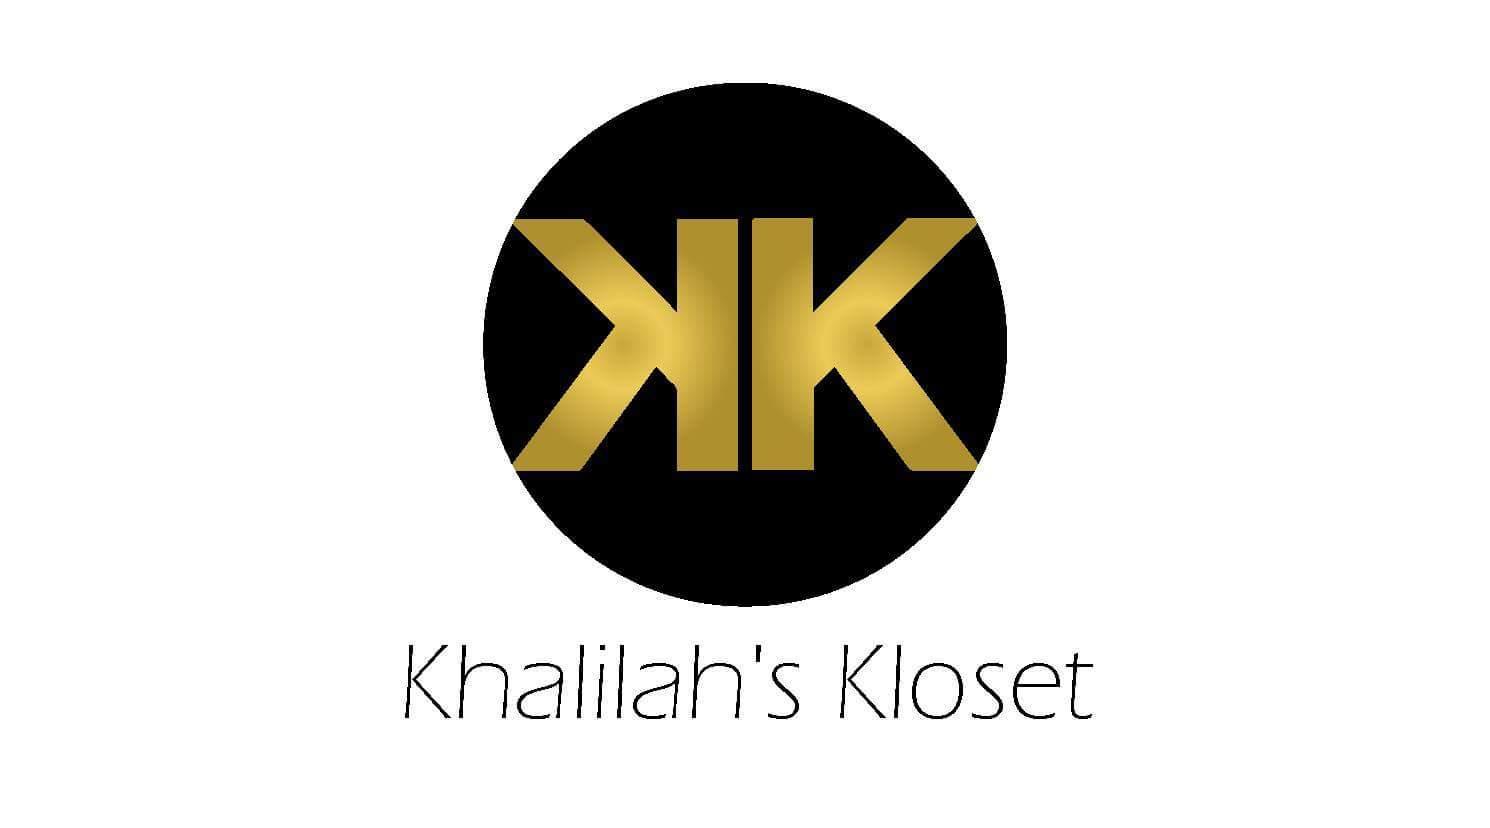 Khalilah's Kloset